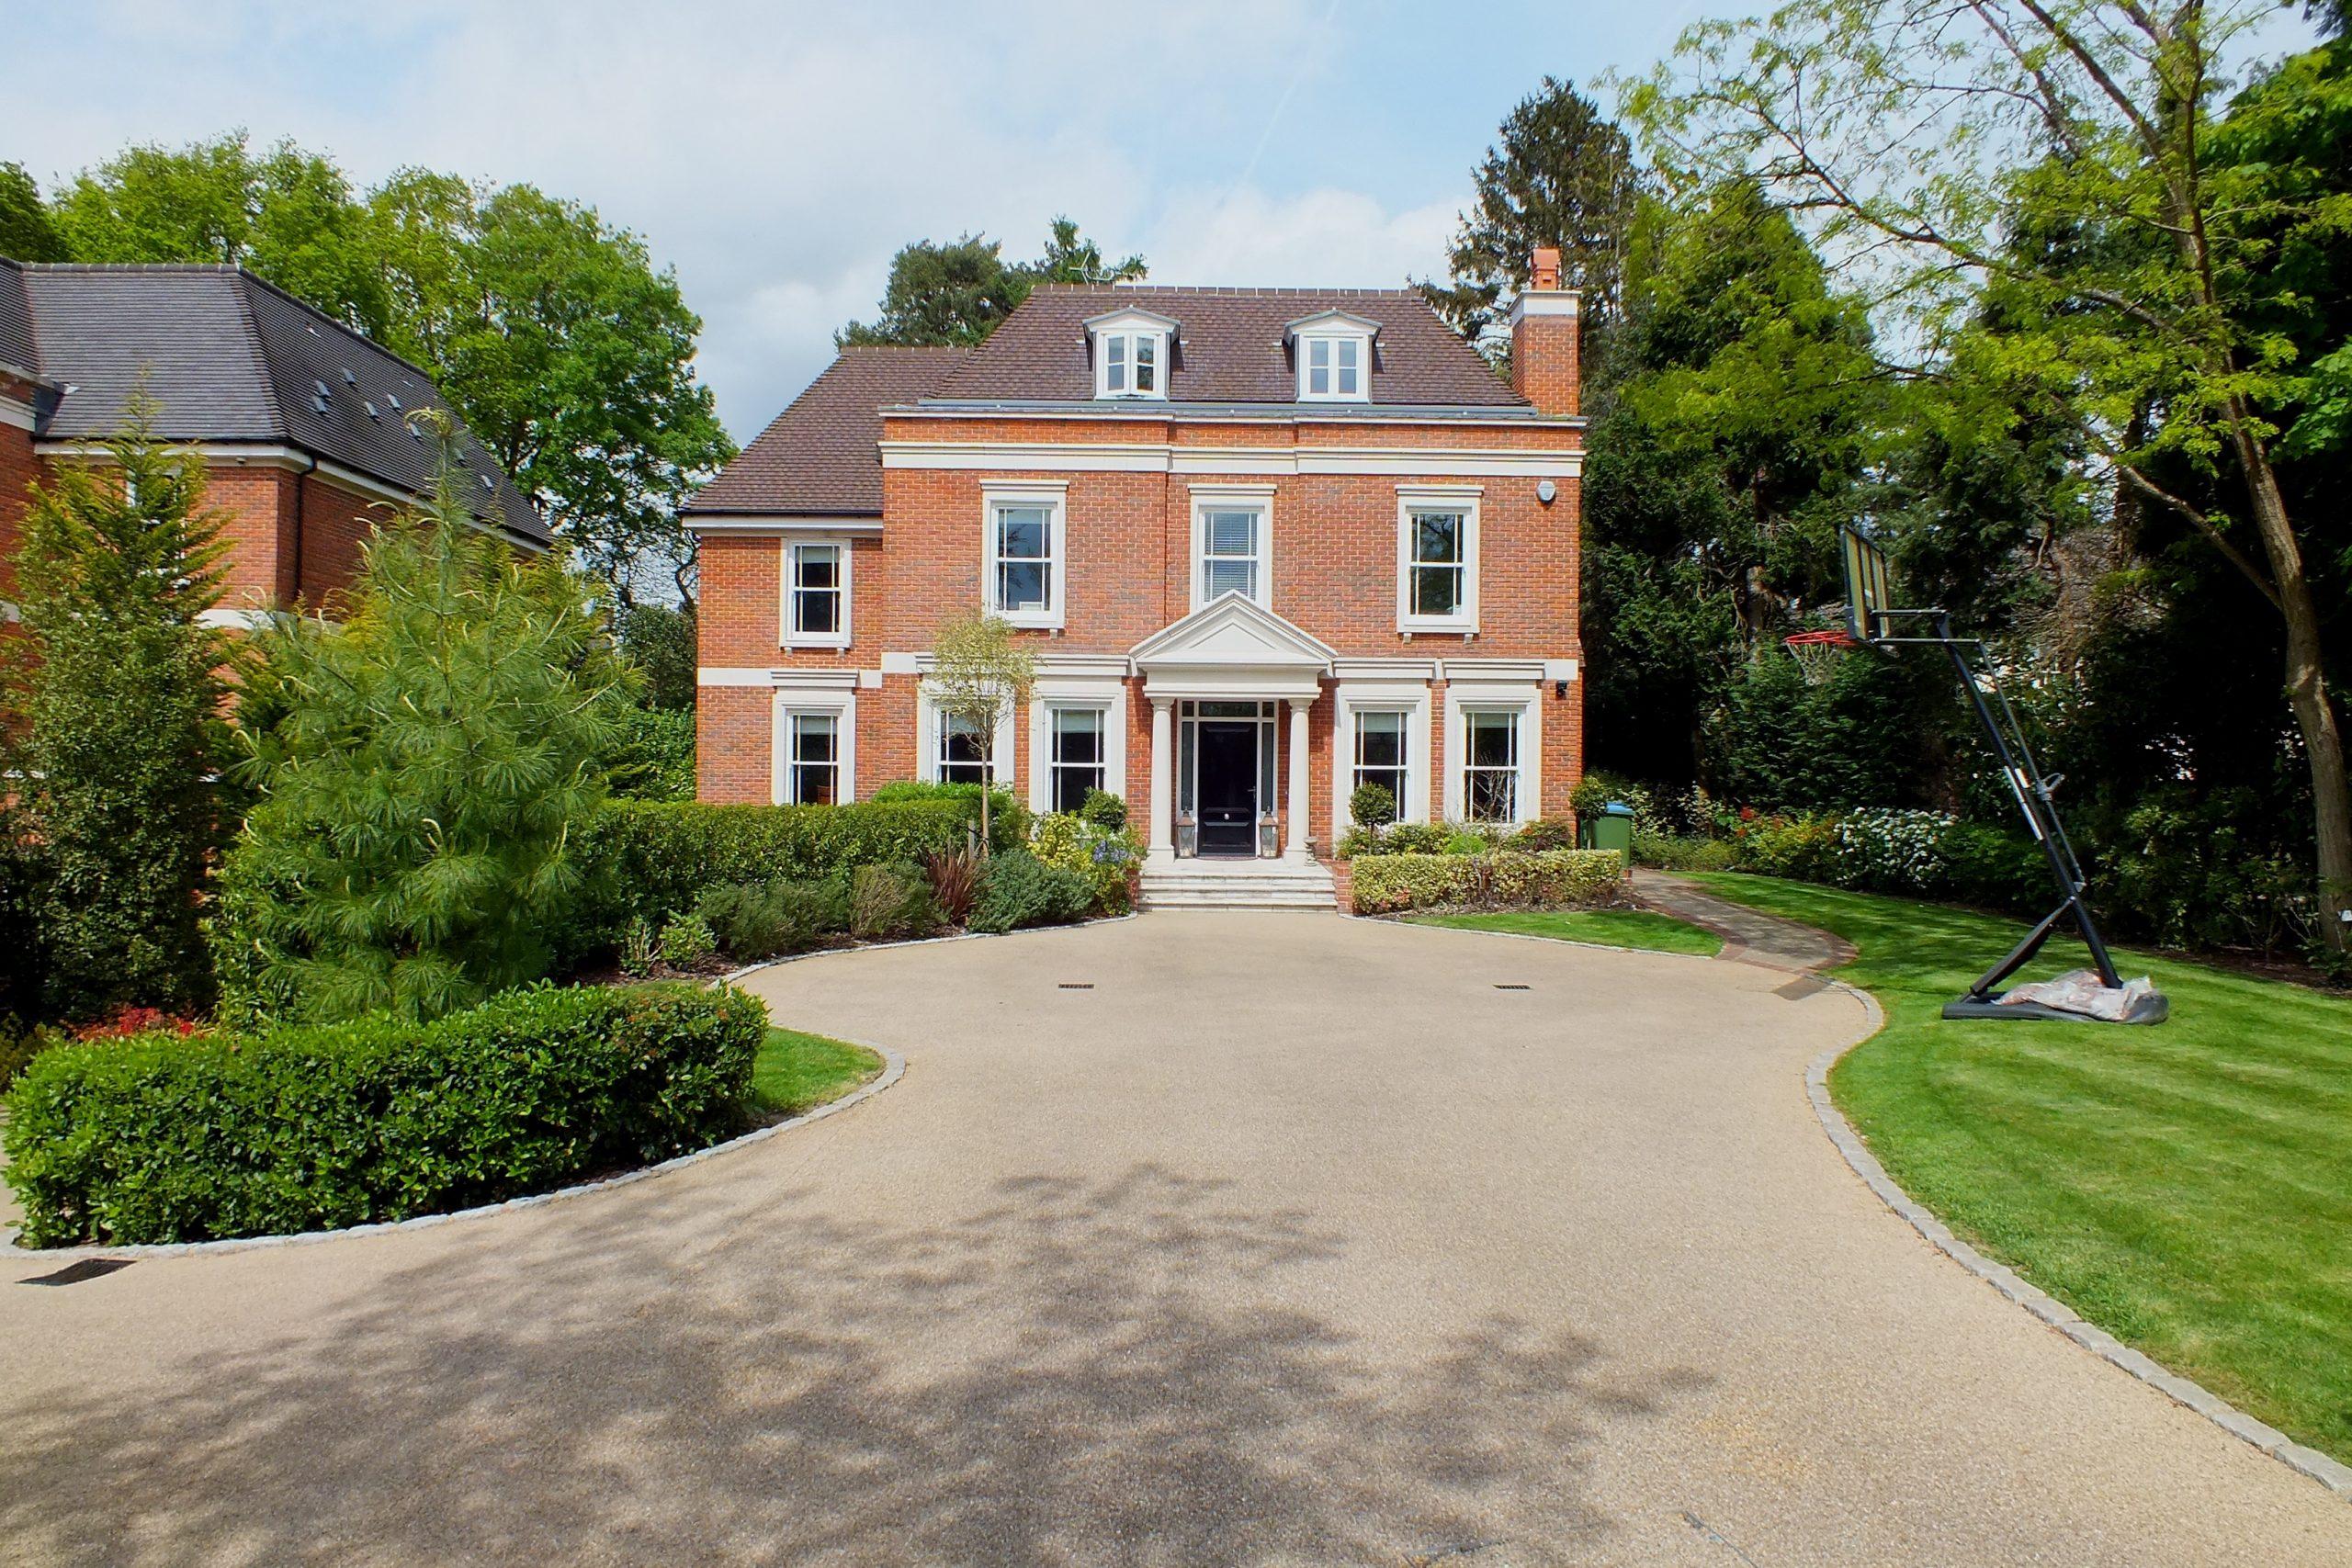 LET: Hepburn House, 13 Eaton Park Road, Cobham, KT11 2JJ